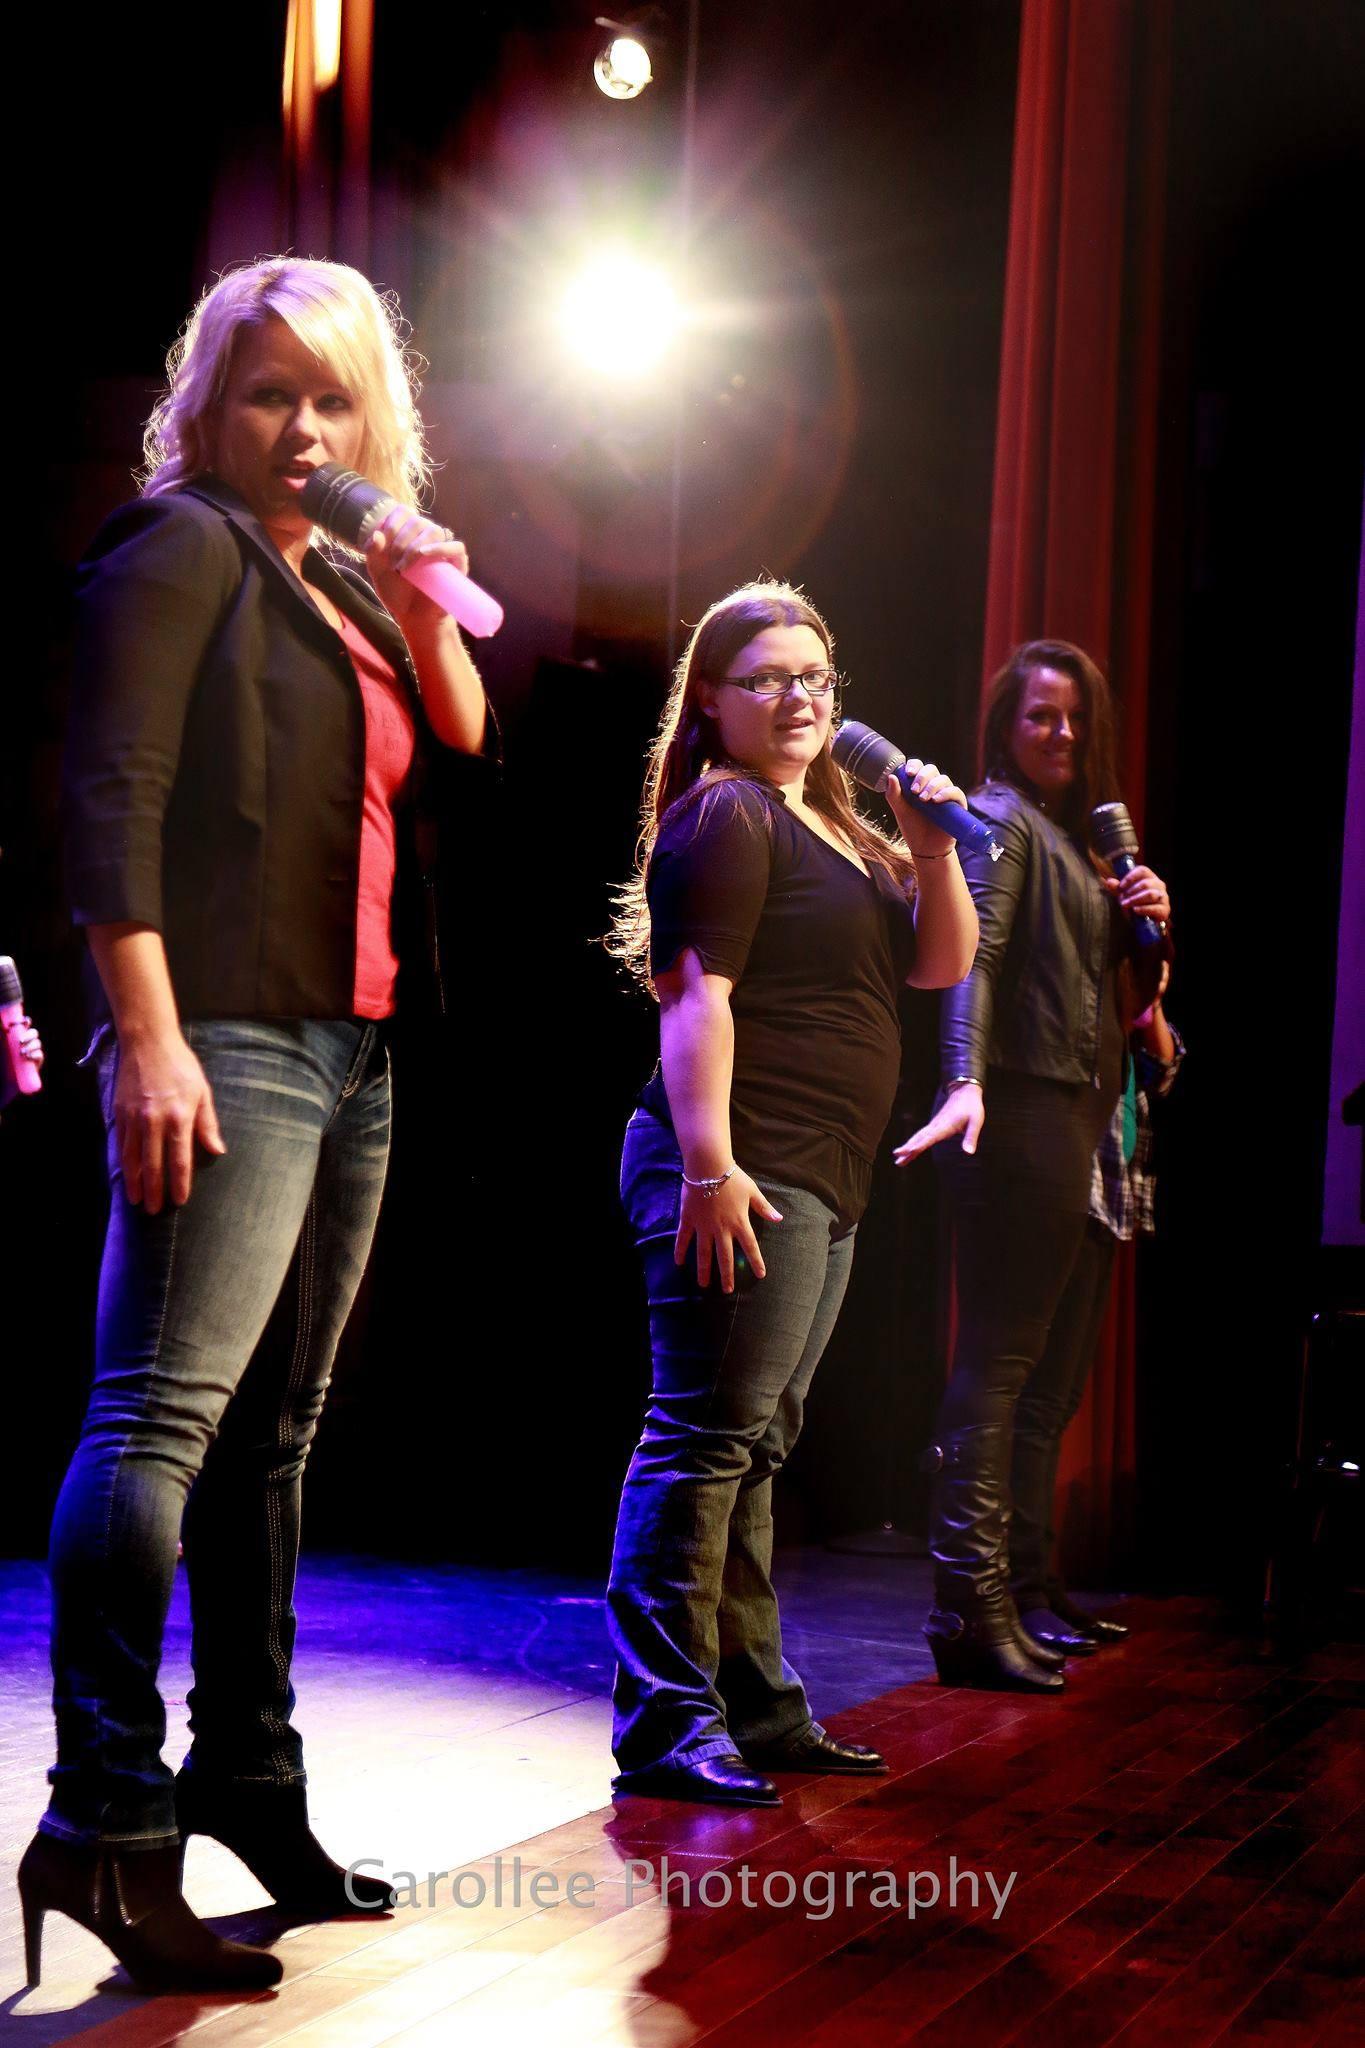 Jenny Cole, Julia Tharp & Danielle MacClaren perform pitch perfect at Bridges Lip Sync Battle Fundraiser